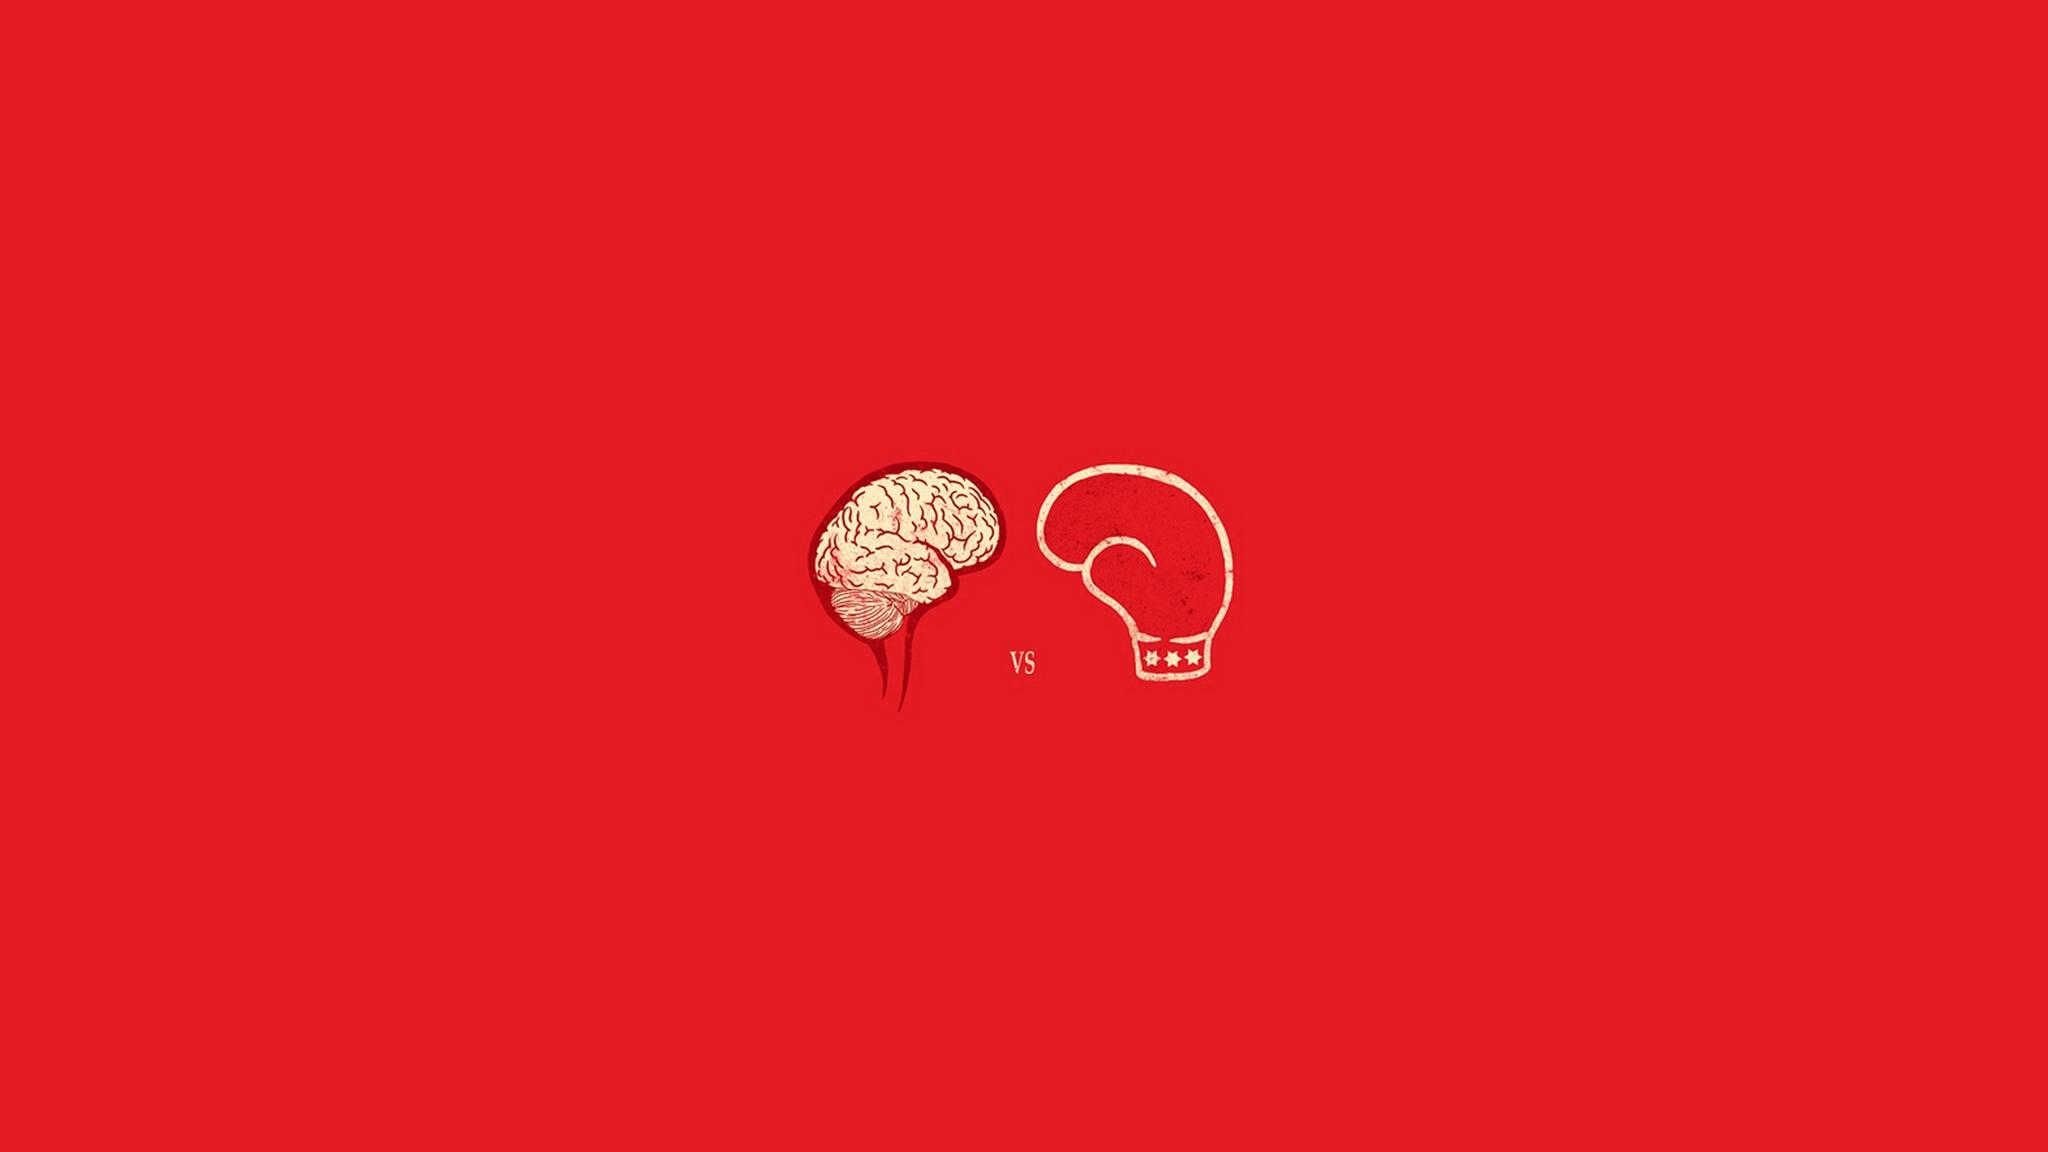 Download wallpaper 2048x1152 glove mind boxing brain strength 2048x1152